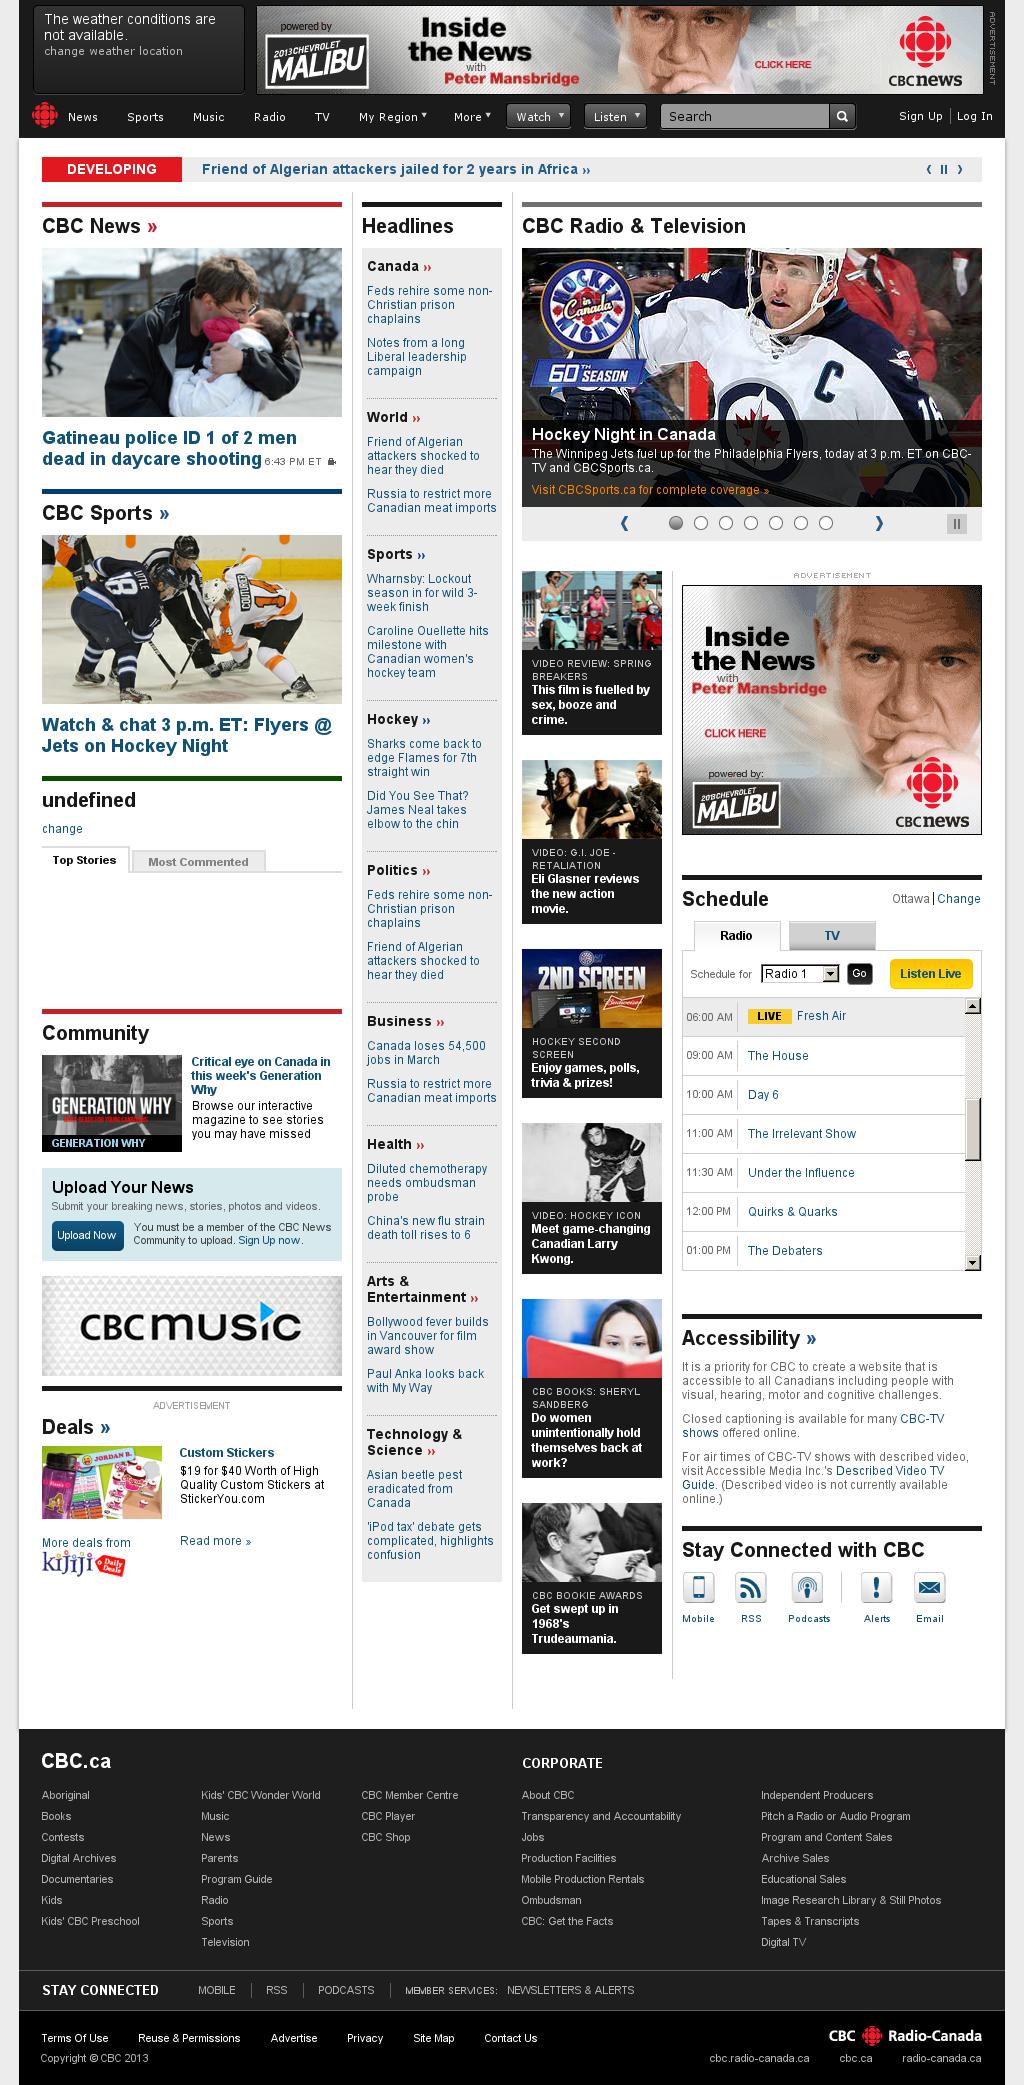 CBC at Saturday April 6, 2013, 10:03 a.m. UTC